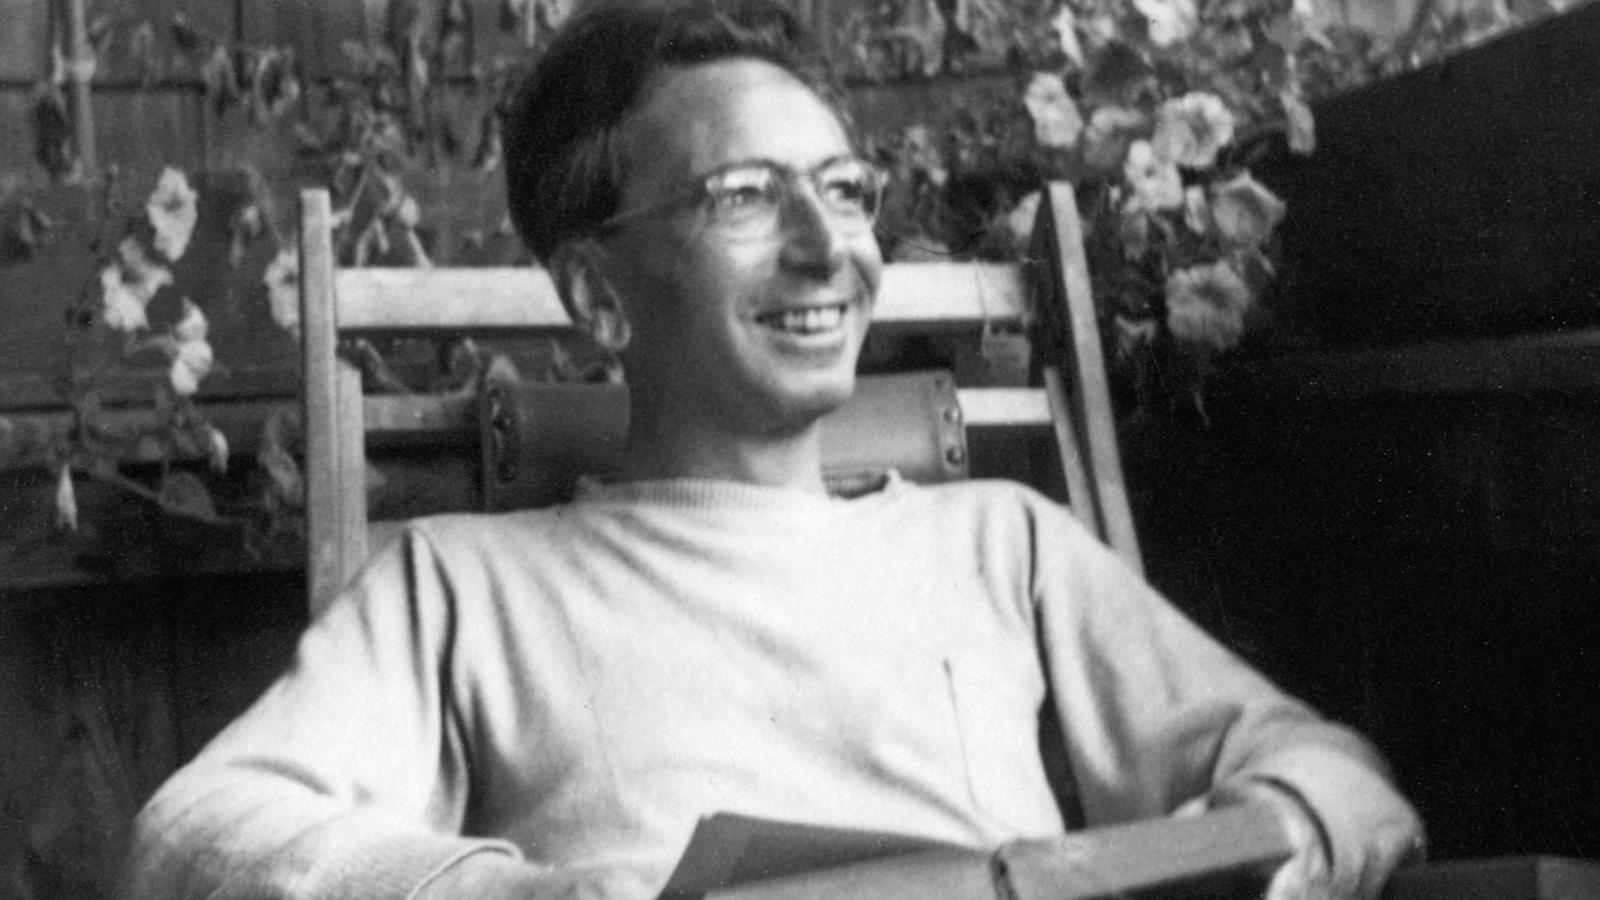 Viktor Frankl, Image: Citizens of Culture